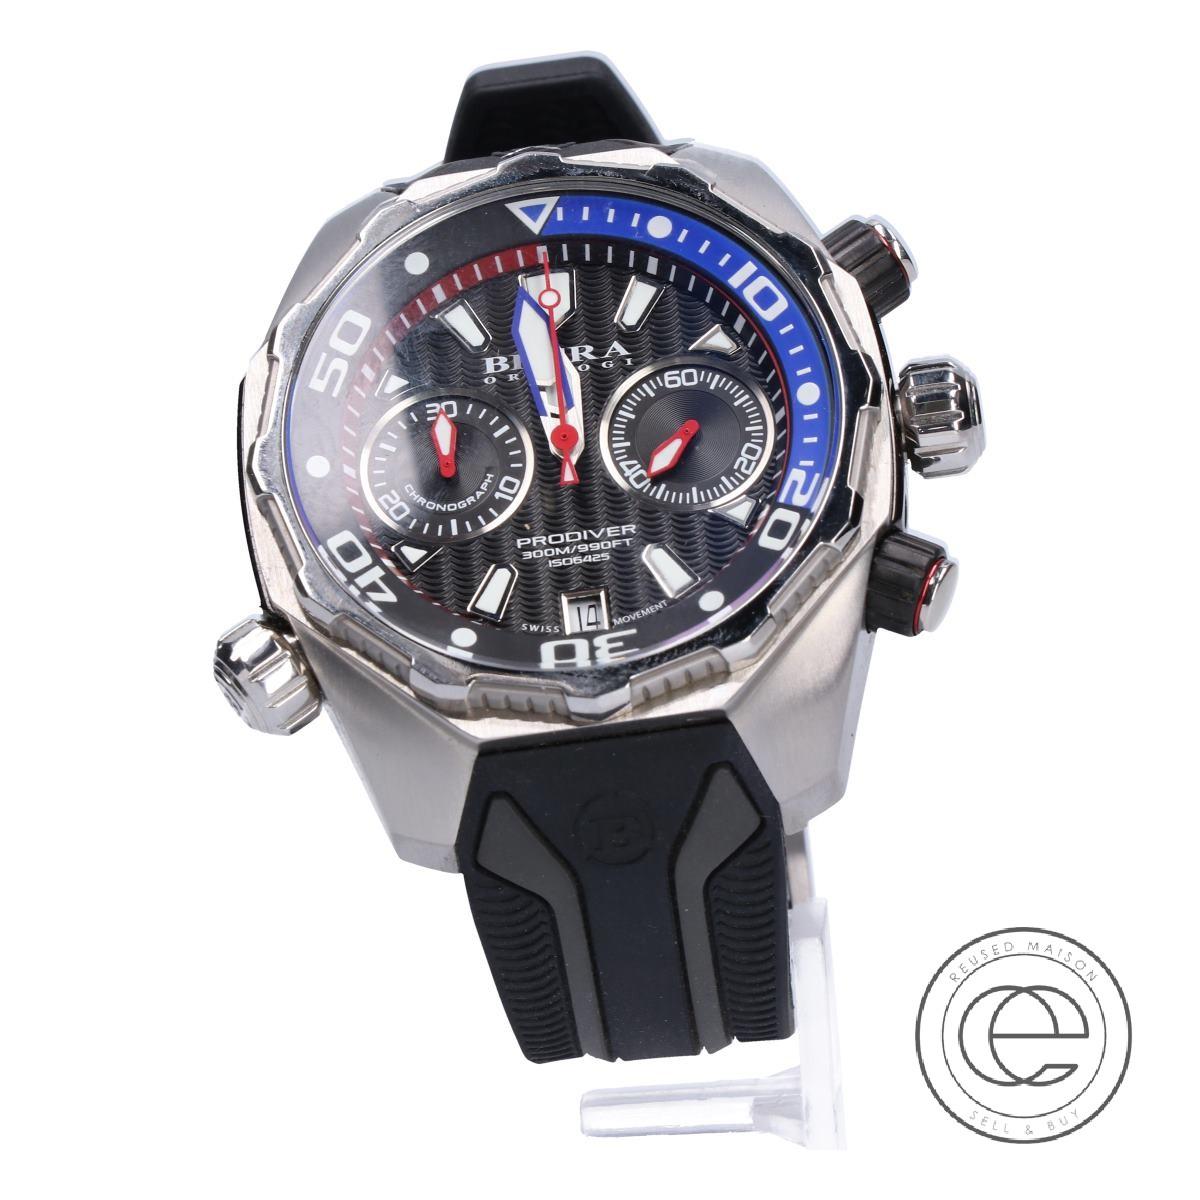 BRERA OROLOGIブレラ オロロジ BRDV2C4701 プロダイバー クロノグラフ SS クオーツ 腕時計 シルバー/ブラック メンズ 【中古】